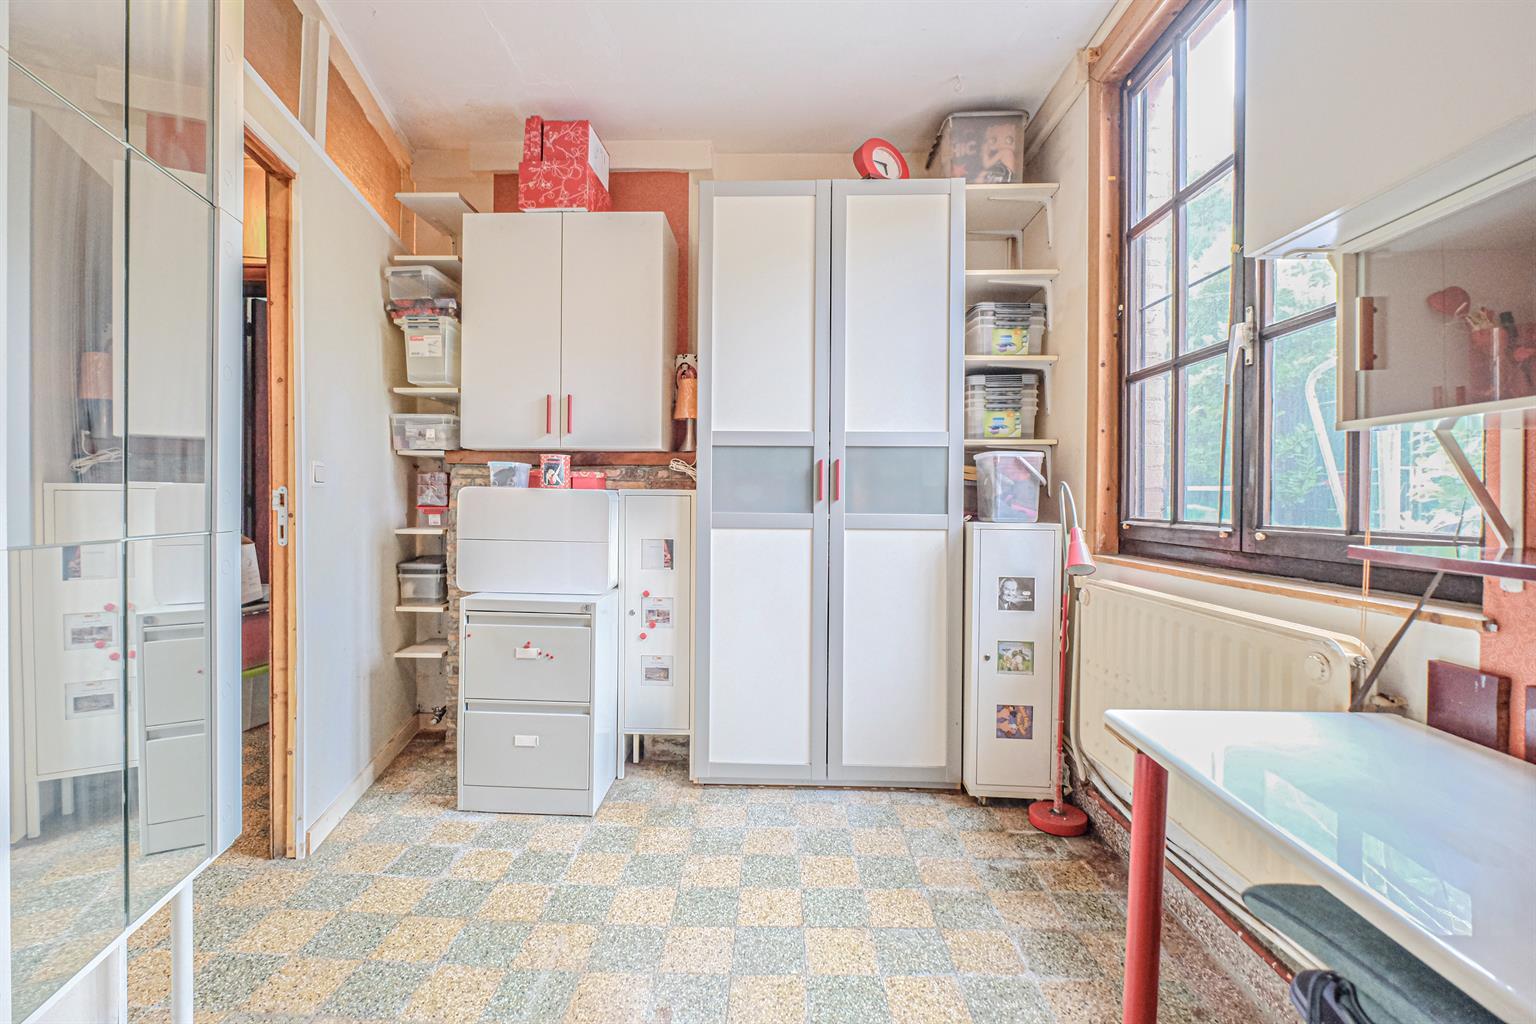 Maison - Tubize - #4437950-20